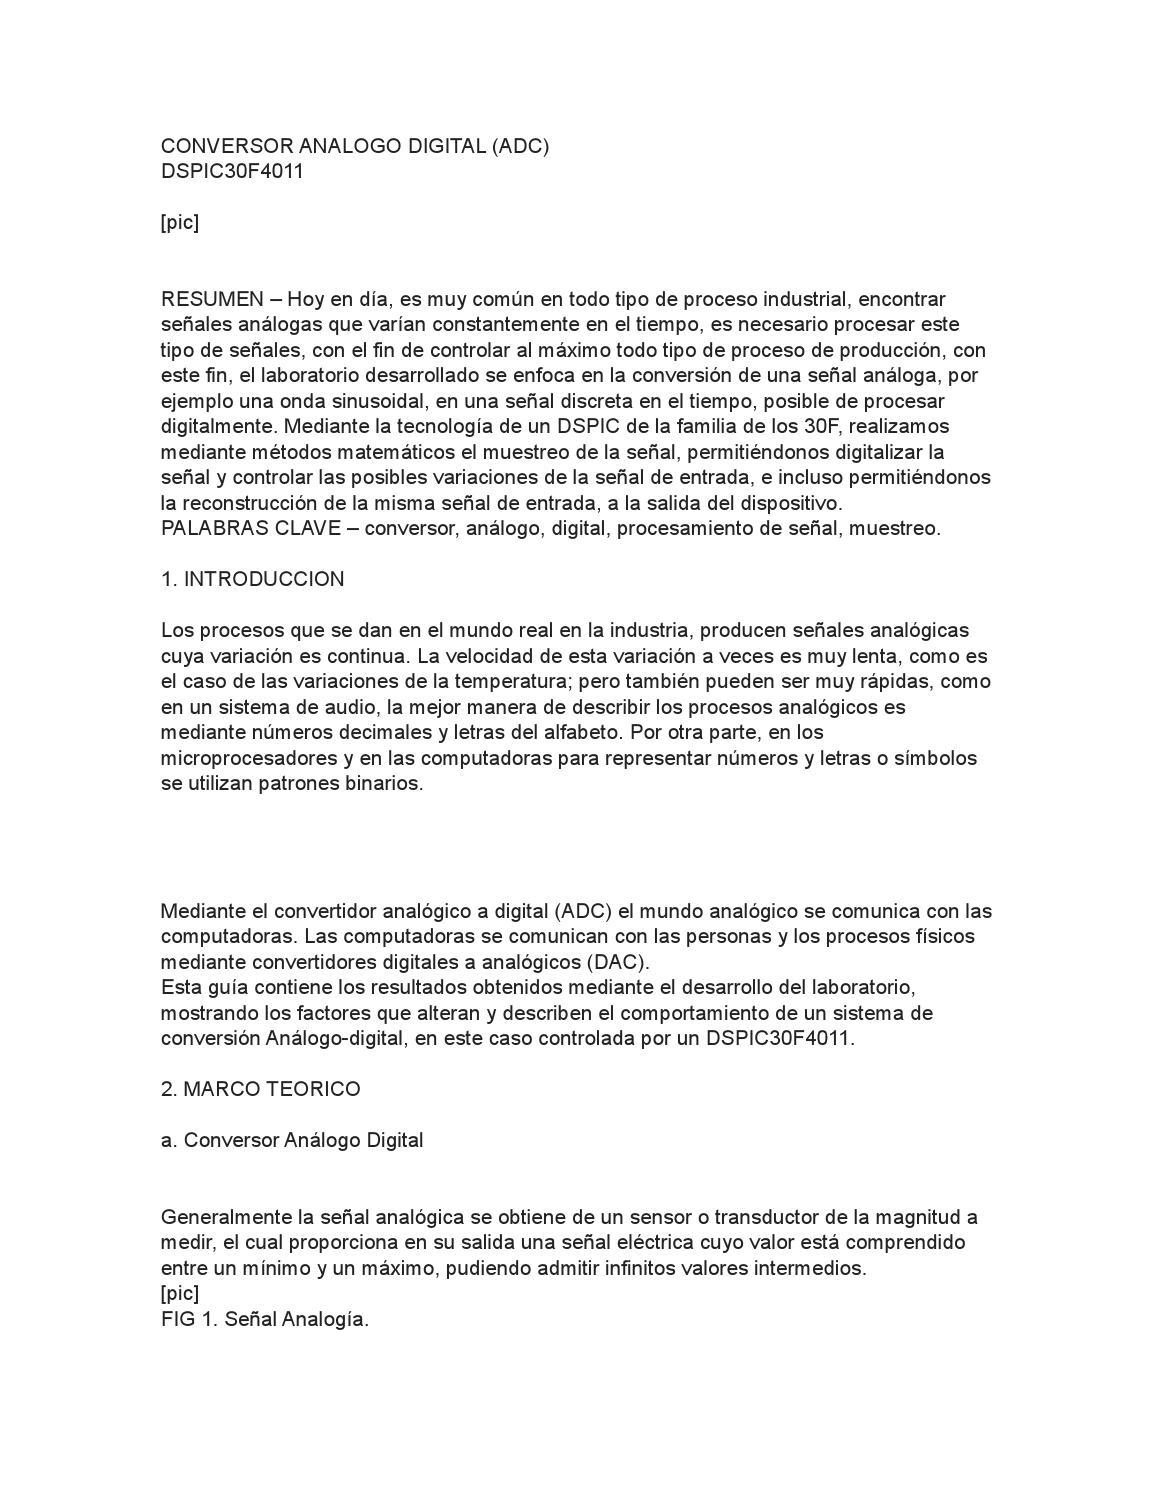 Conversor analogo digital by Eduuard Fraa Dedrick - issuu